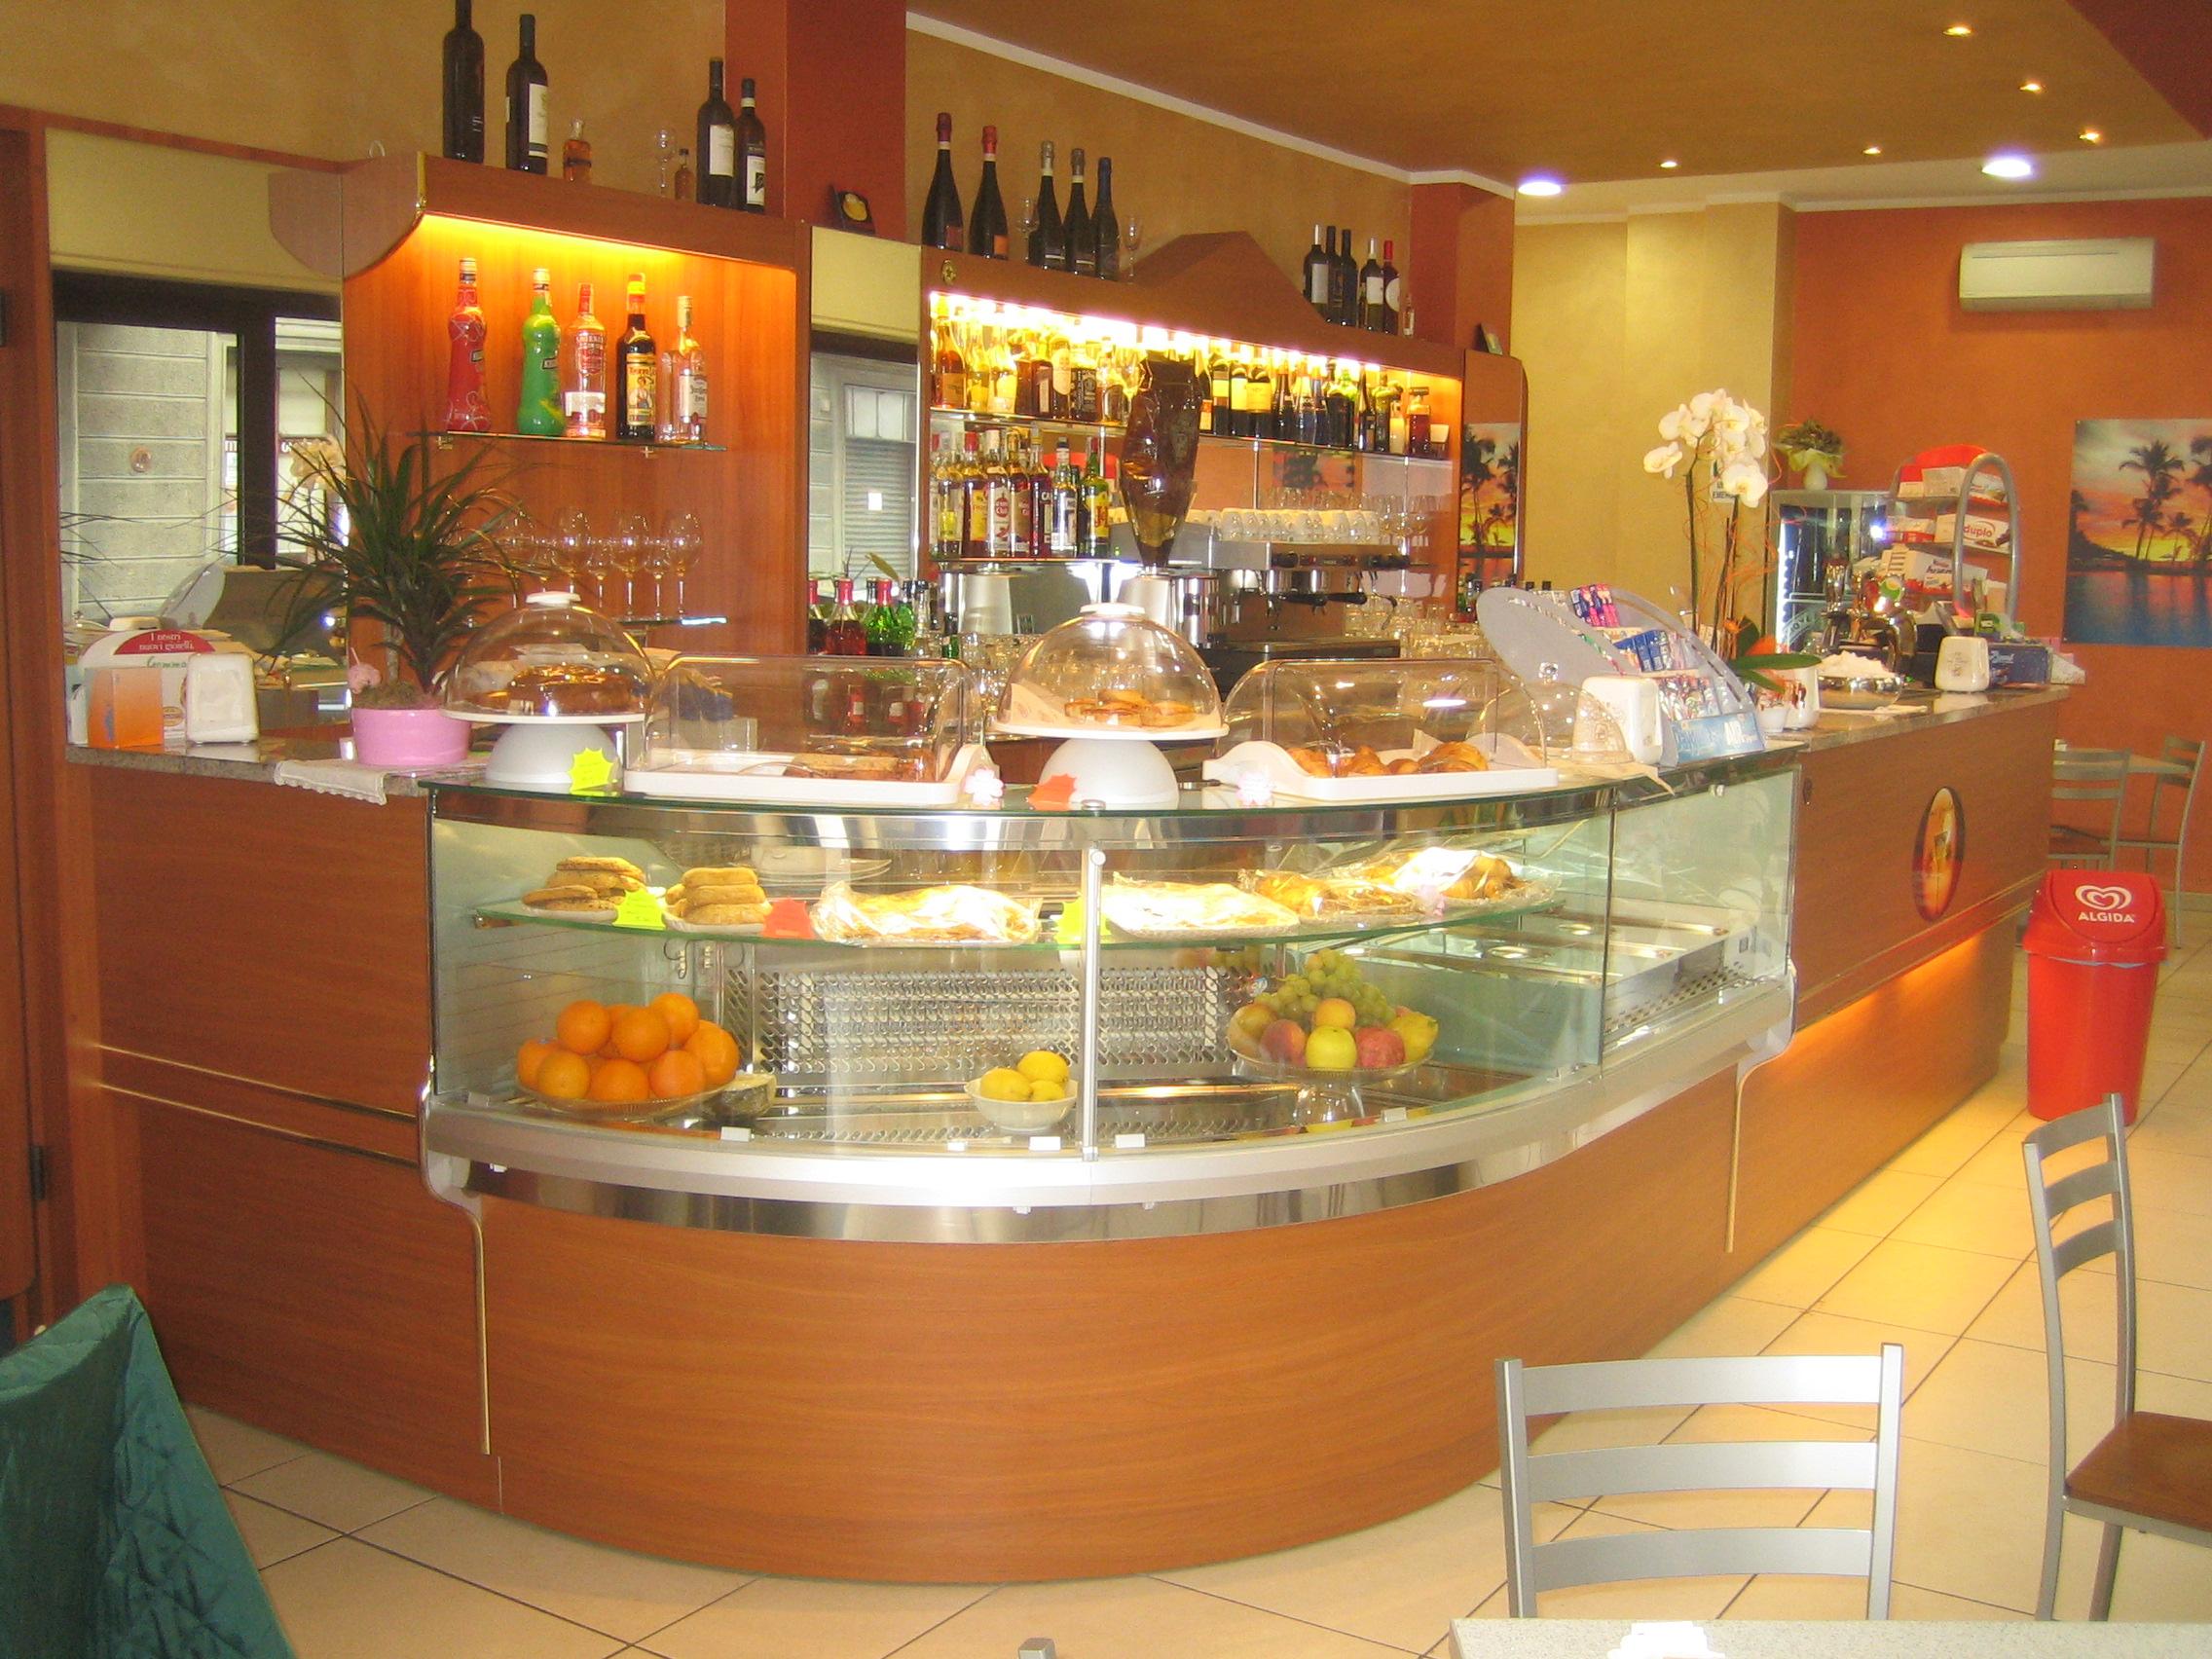 Produttori di Arredamenti per Bar, Negozi, Ristoranti, Attrezzature per Bar, Ristoranti, Banchi ...